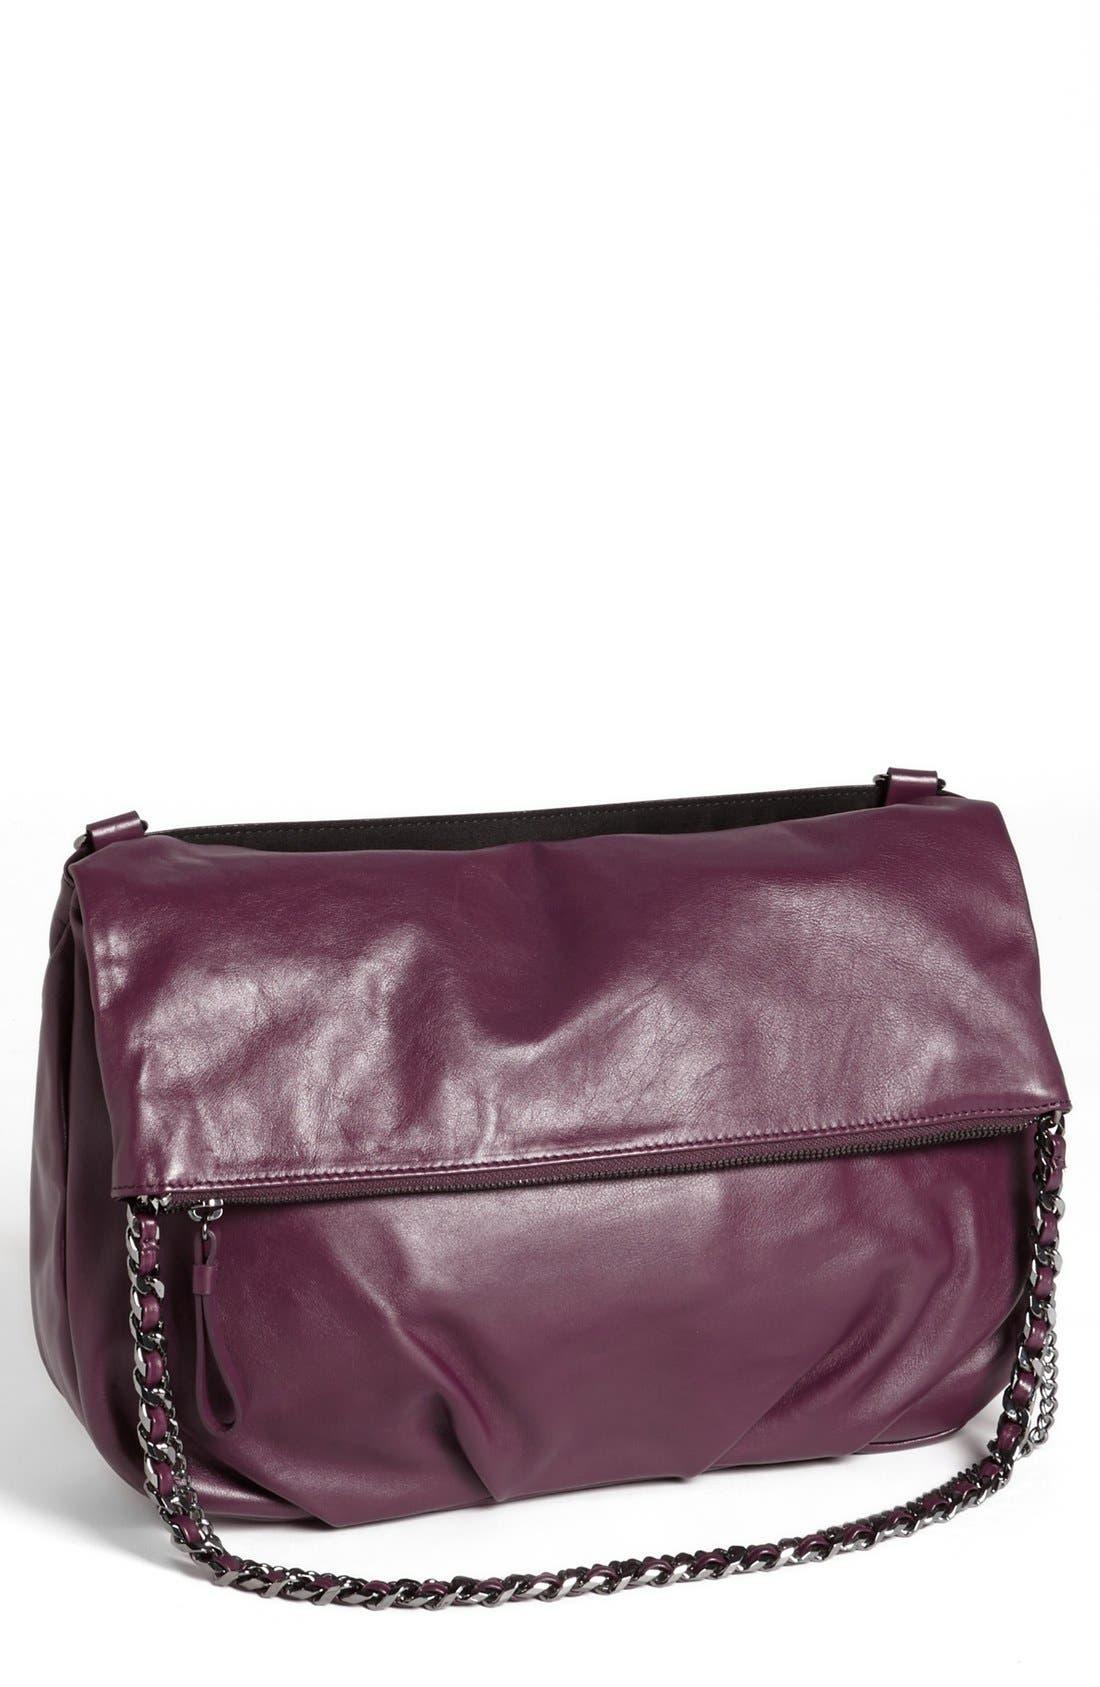 Main Image - Trouvé Foldover Leather Crossbody Bag